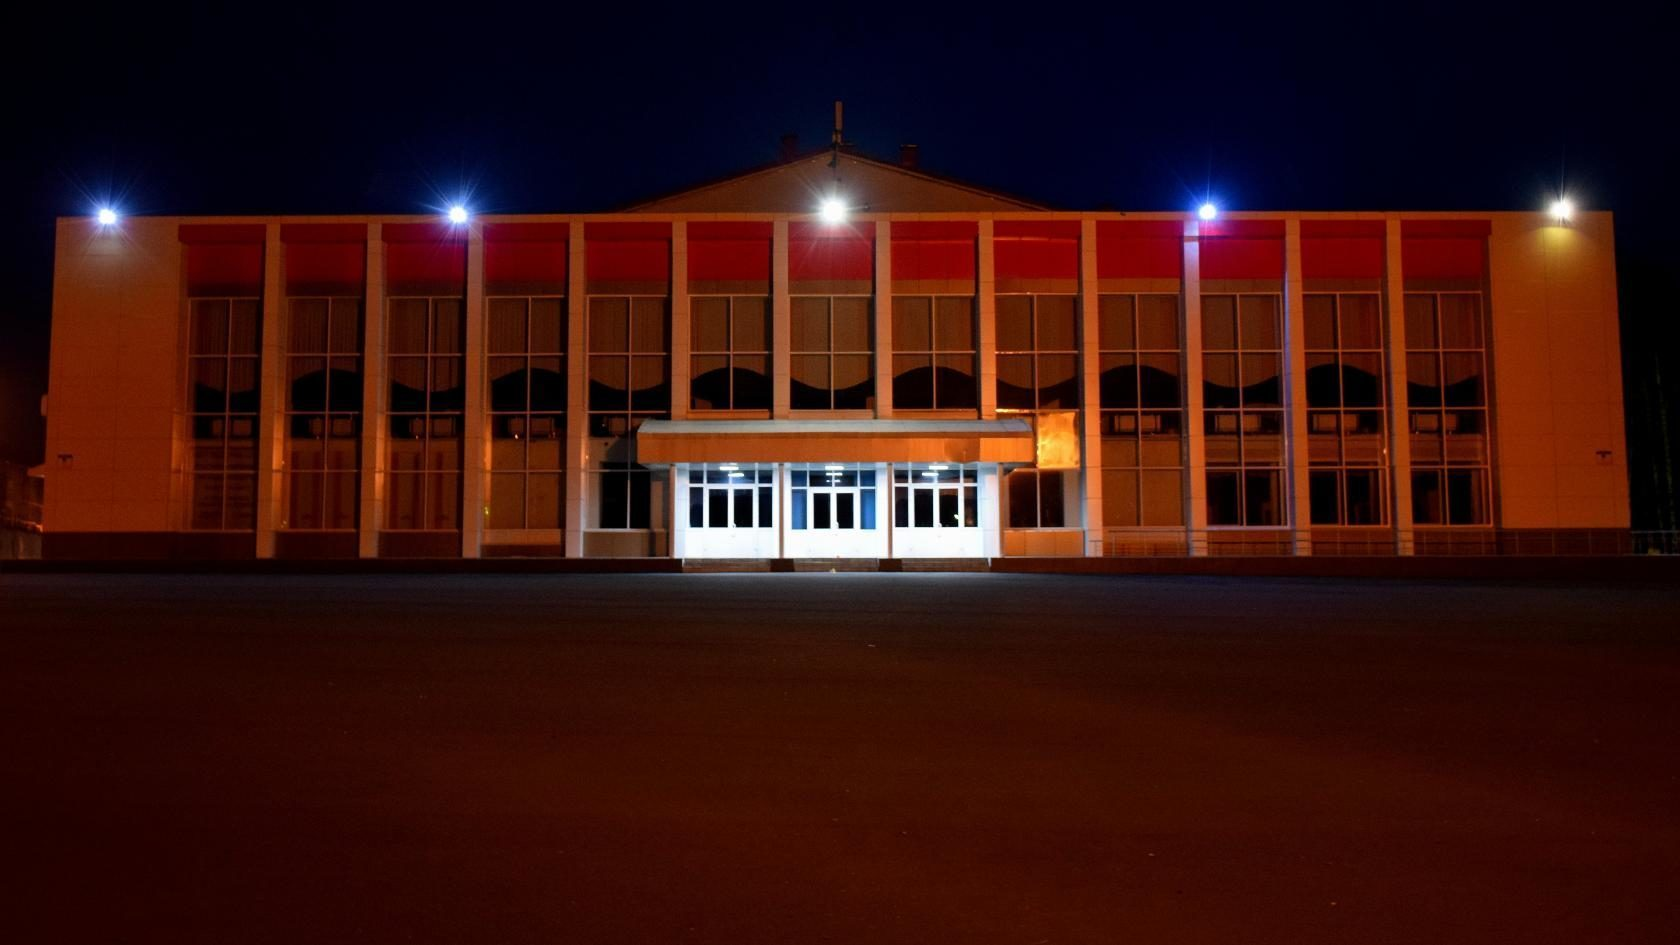 Дворец культуры в Качканаре. Фото: Вадим Баталов